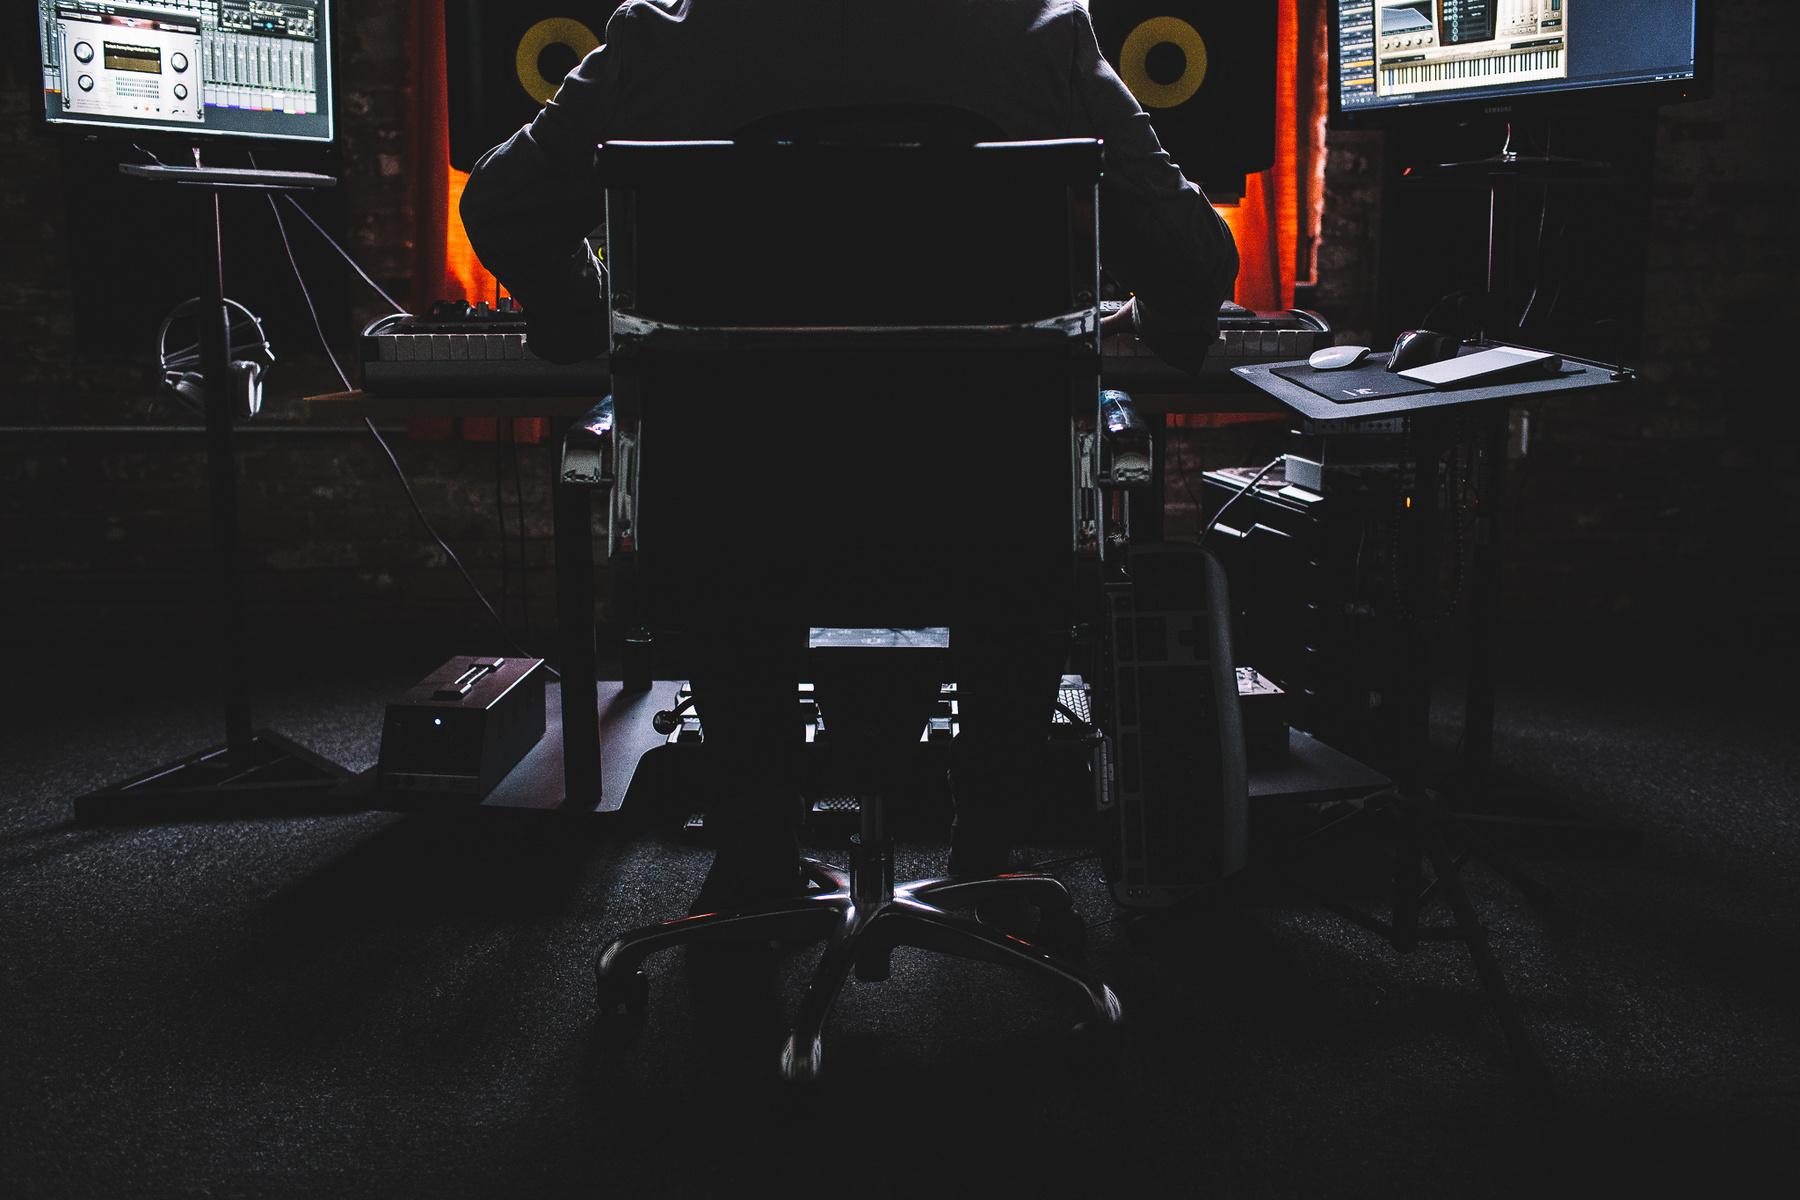 david-decker-neosonic-productions.jpg